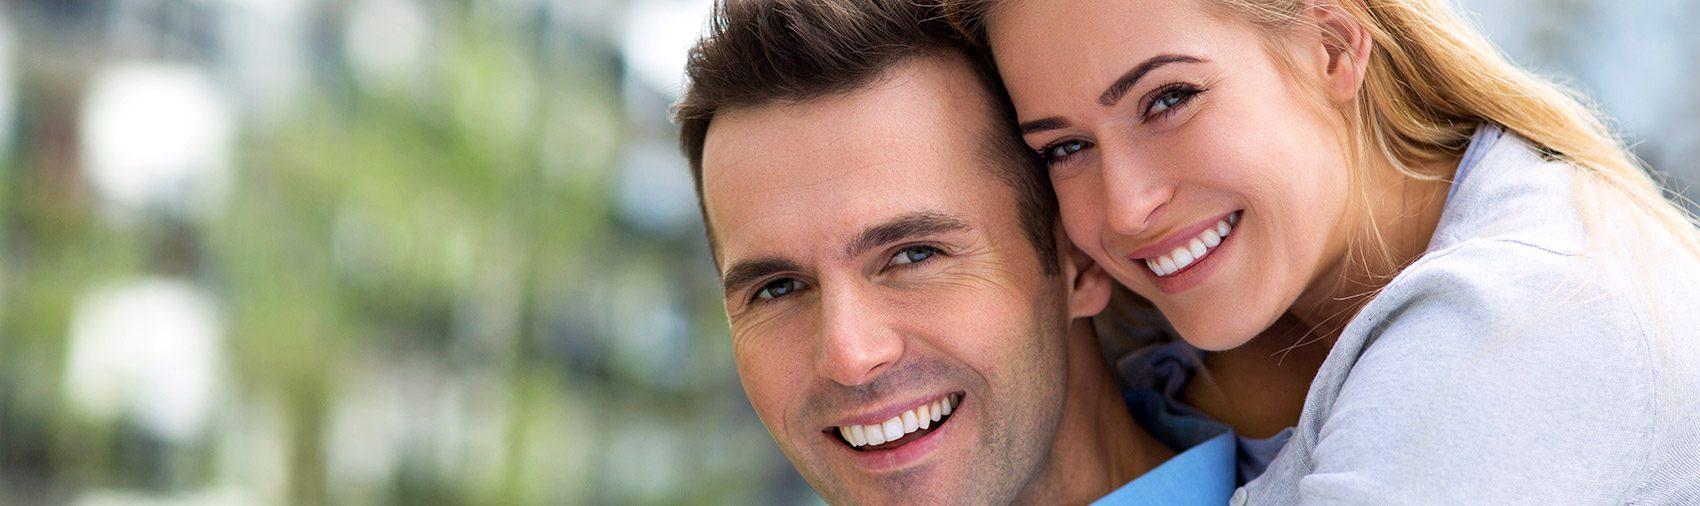 Get Clear Teeth - Meredith Levine, DDS, Inc.